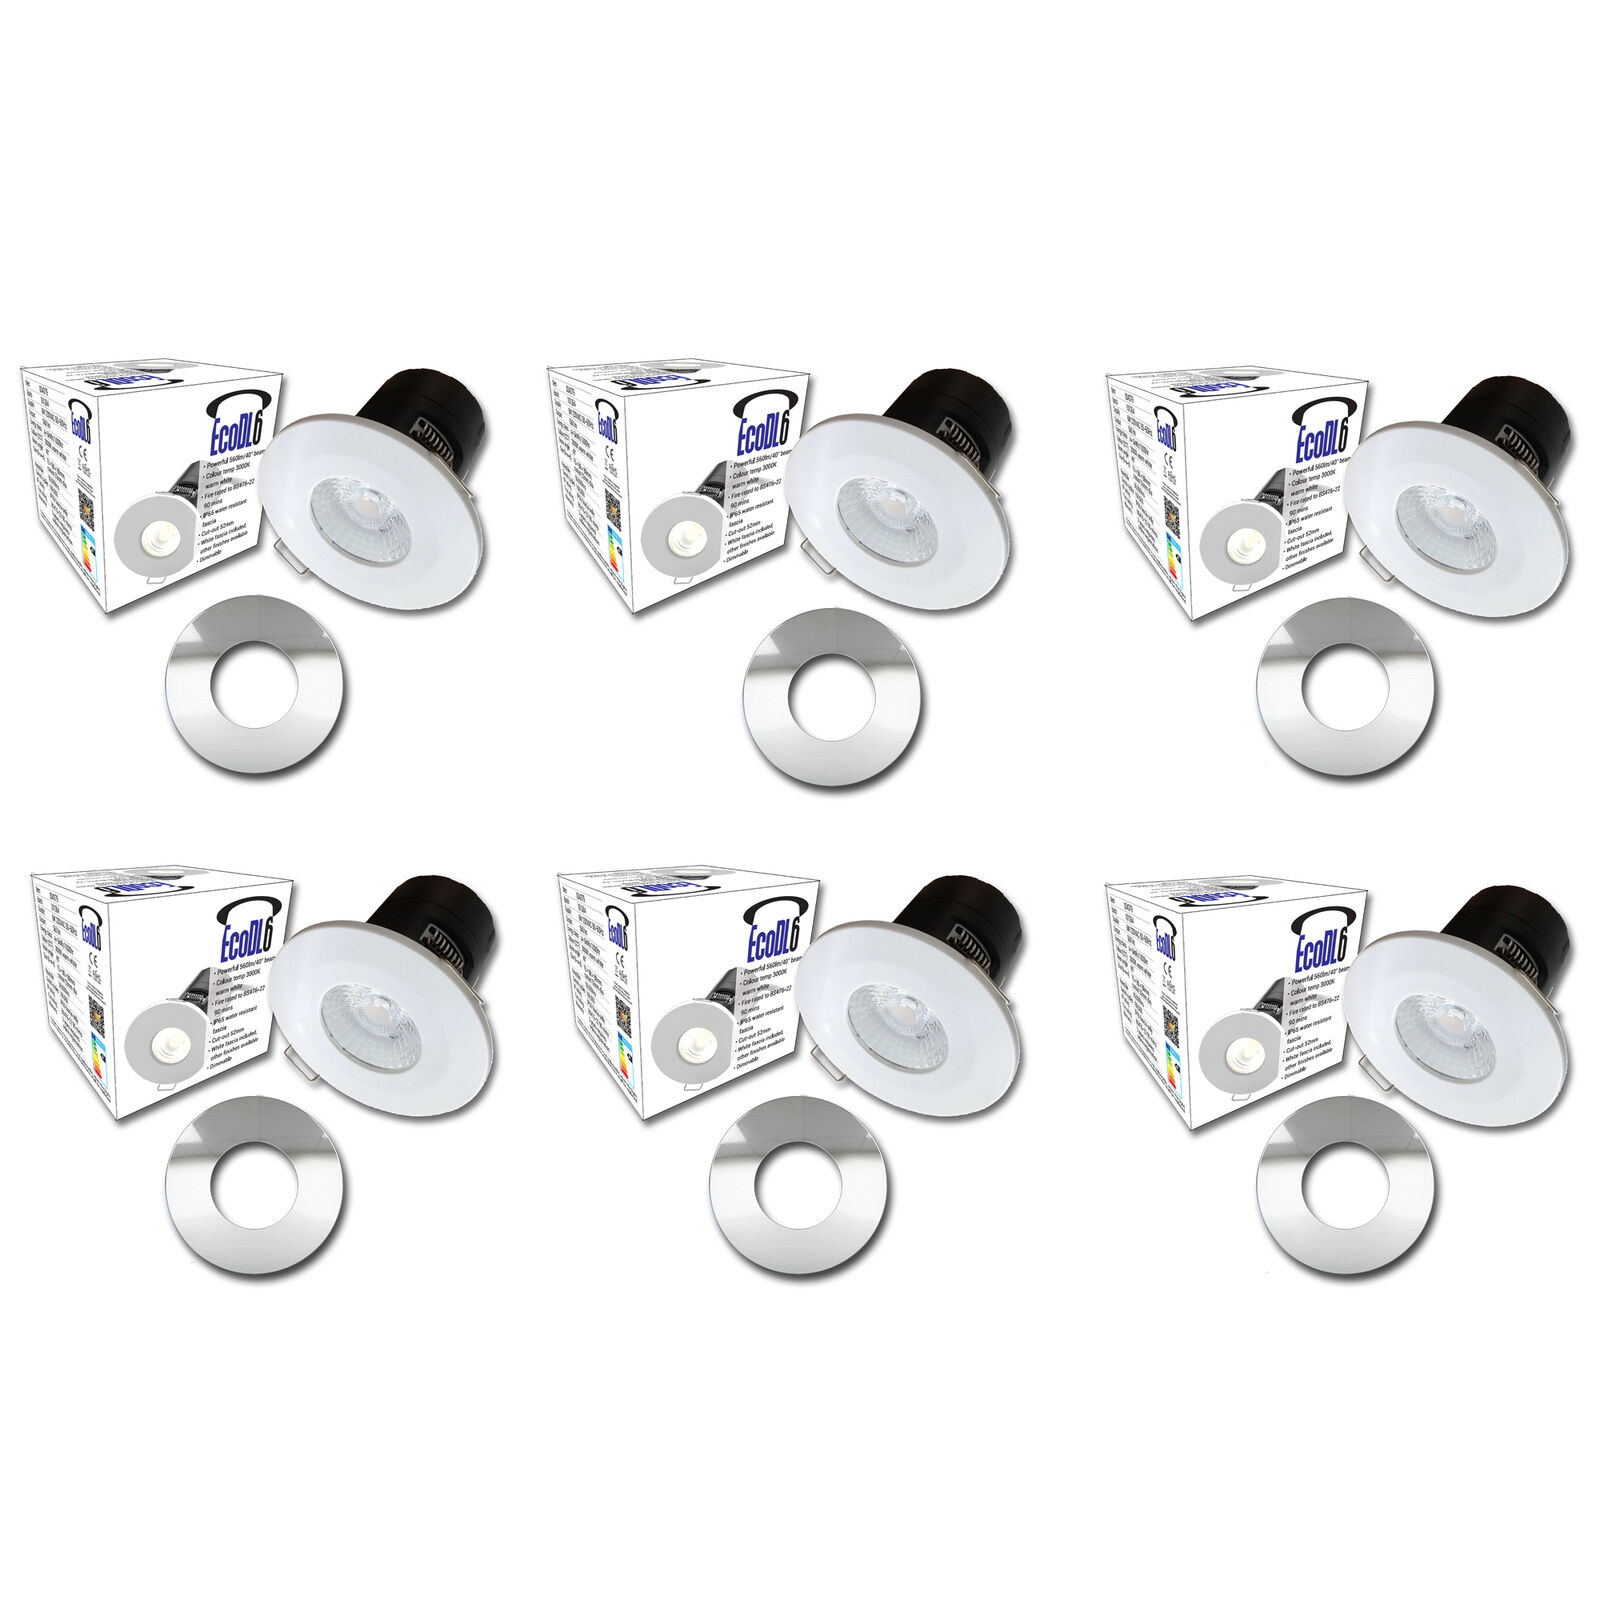 6x 6w LED Downlight 600Lm 4000k blancoo Frío Regulable 55mm Recorte Acero Fascia